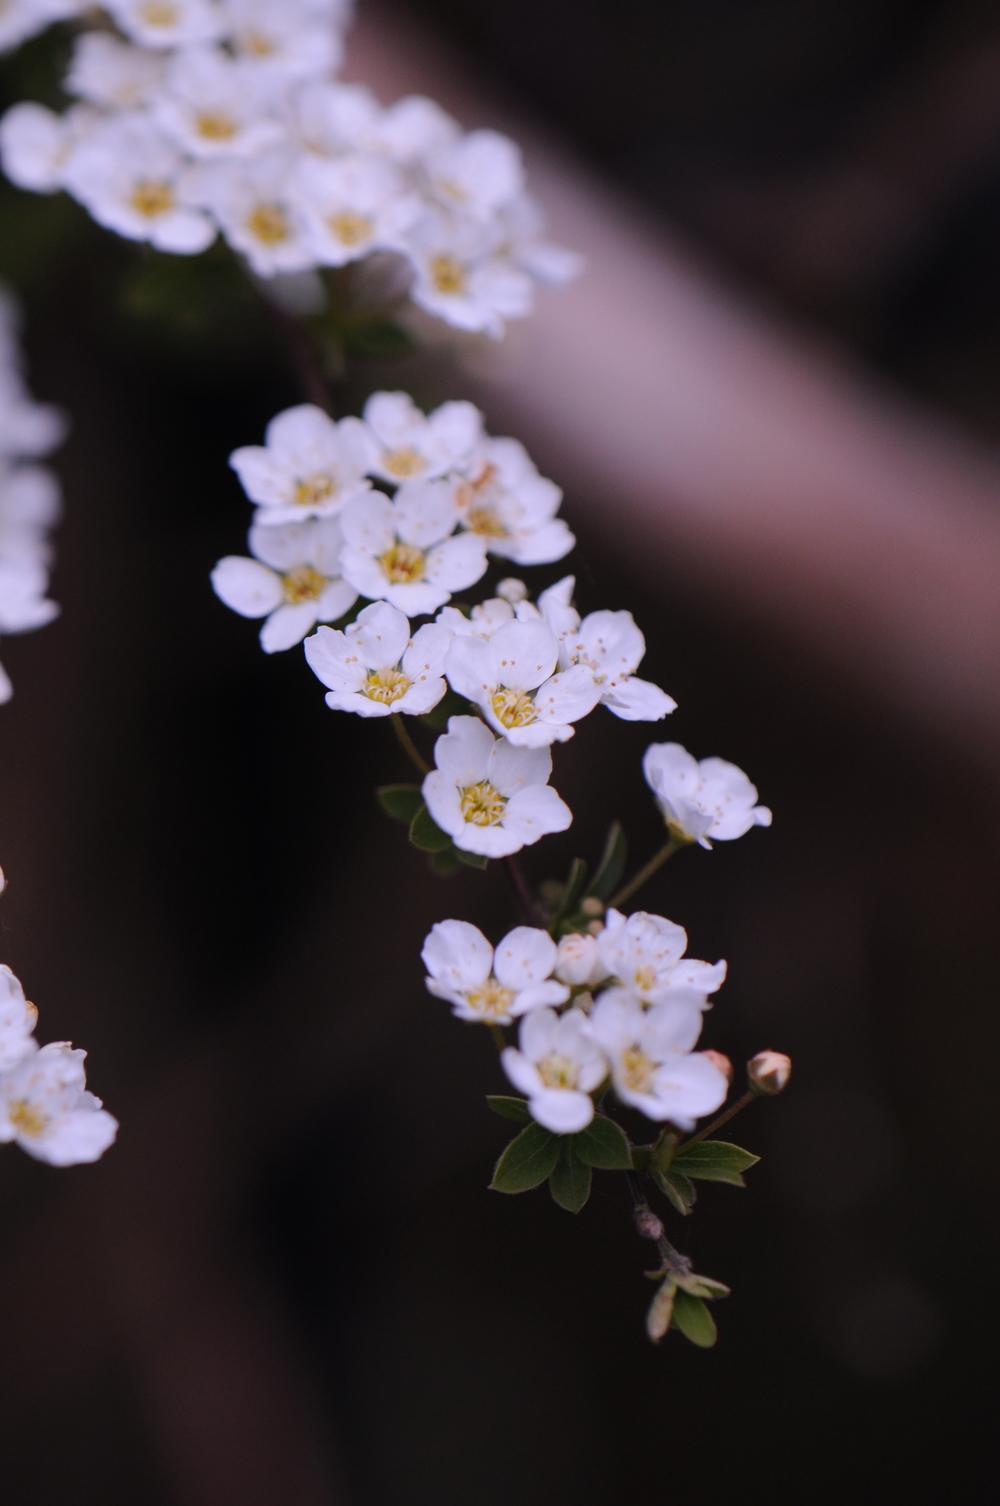 Awakening- blossom